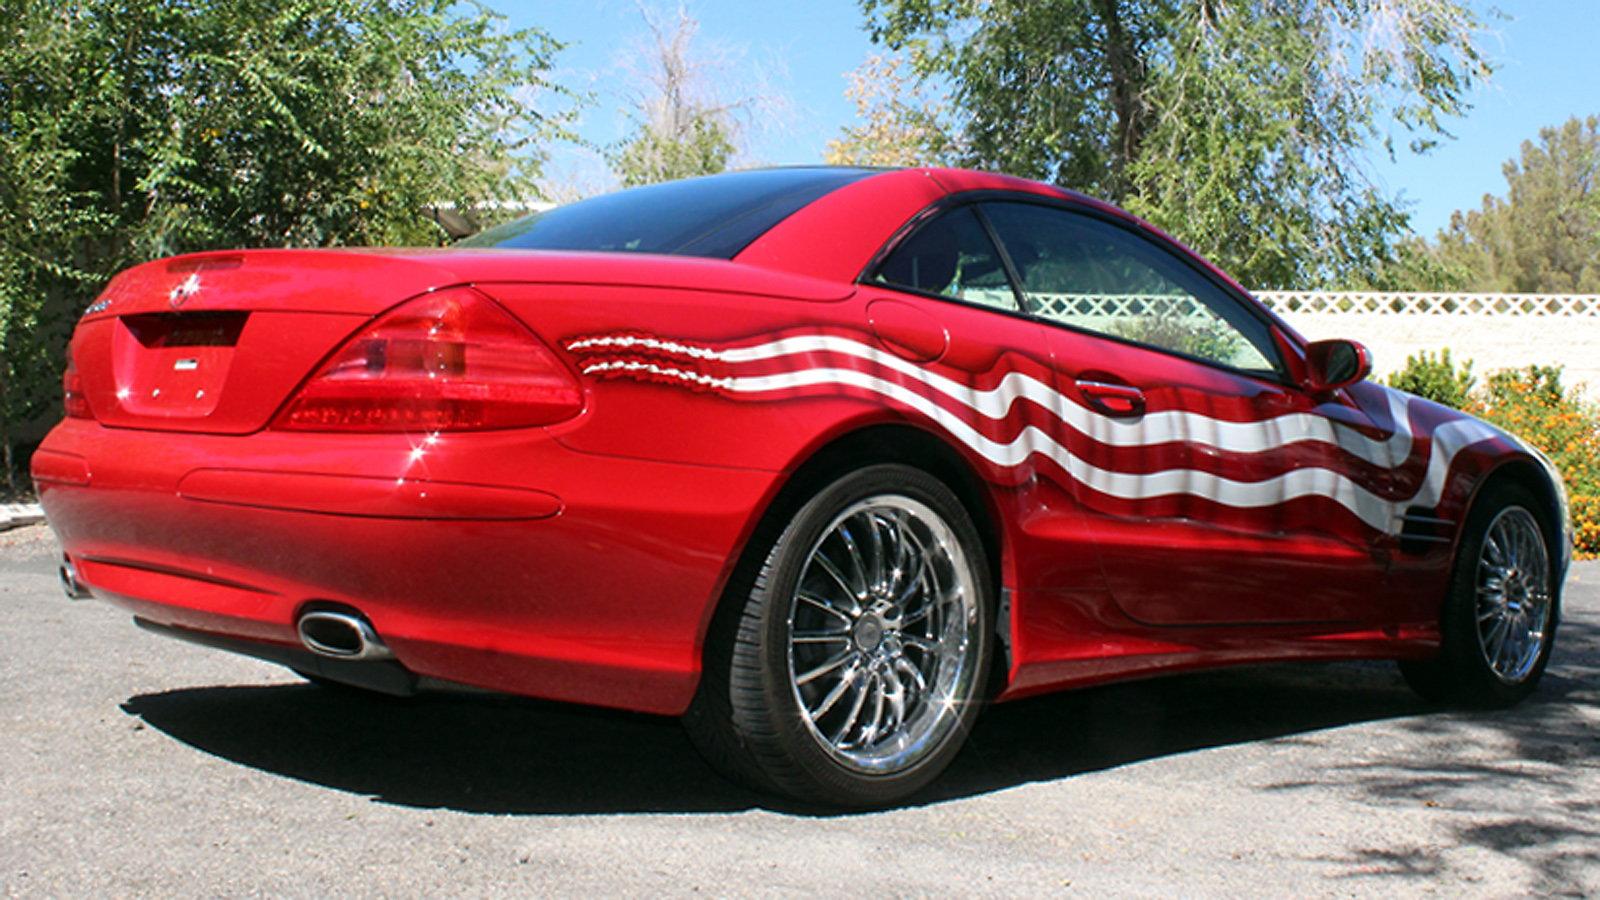 That's No Wrap: B-J Sells the Most Patriotic '04 SL500 in Las Vegas